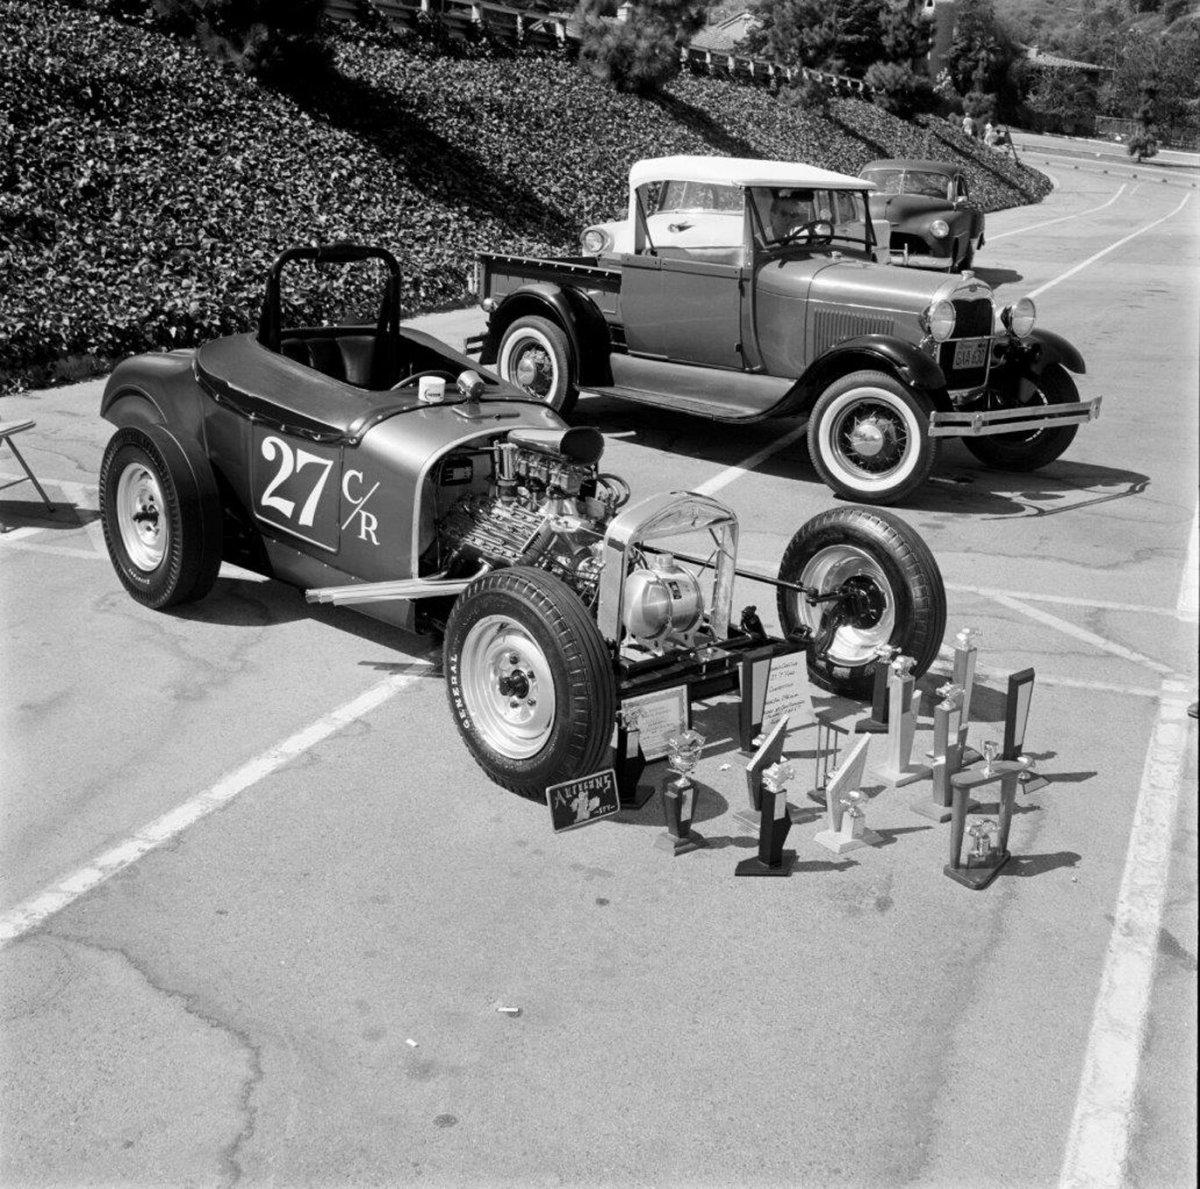 006-2015-la-roadster-show-1960-show-sunday.jpg